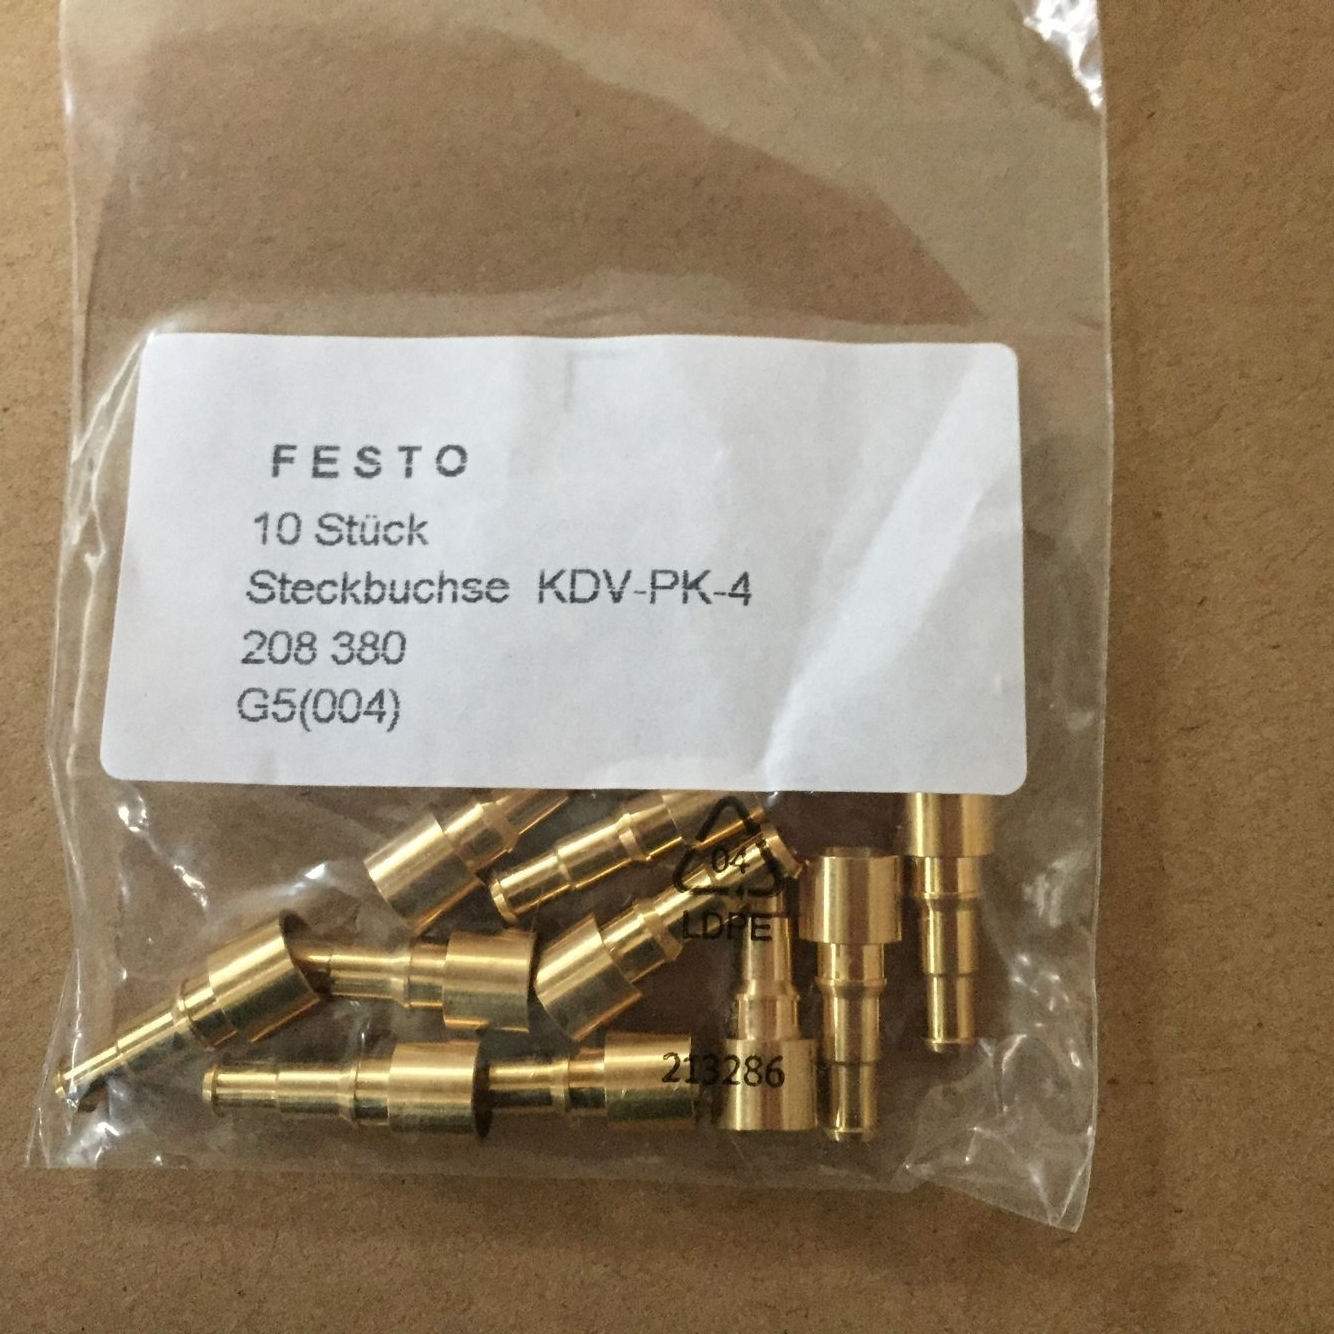 Đầu nối FESTO KDV-PK-4-208380